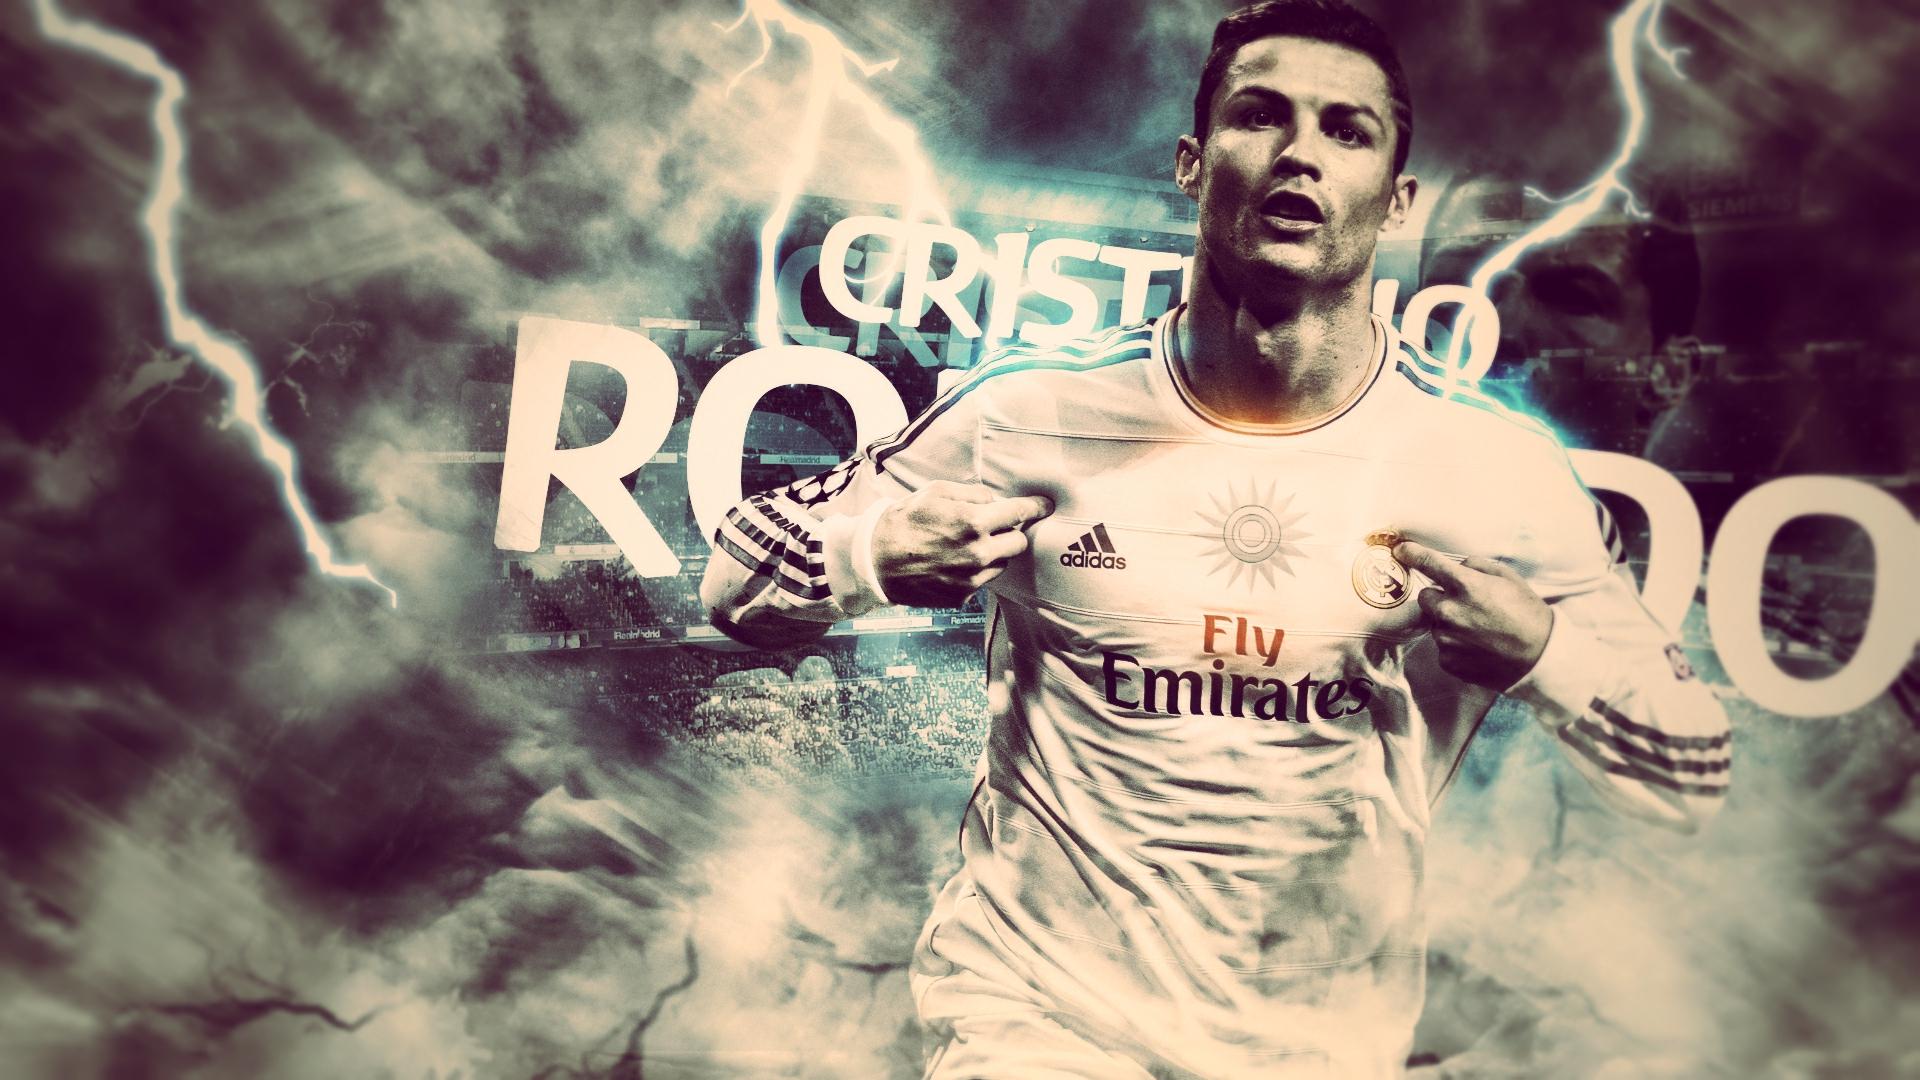 cr7 Ronaldo Wallpaper 5   Football HD Wallpapers 1920x1080